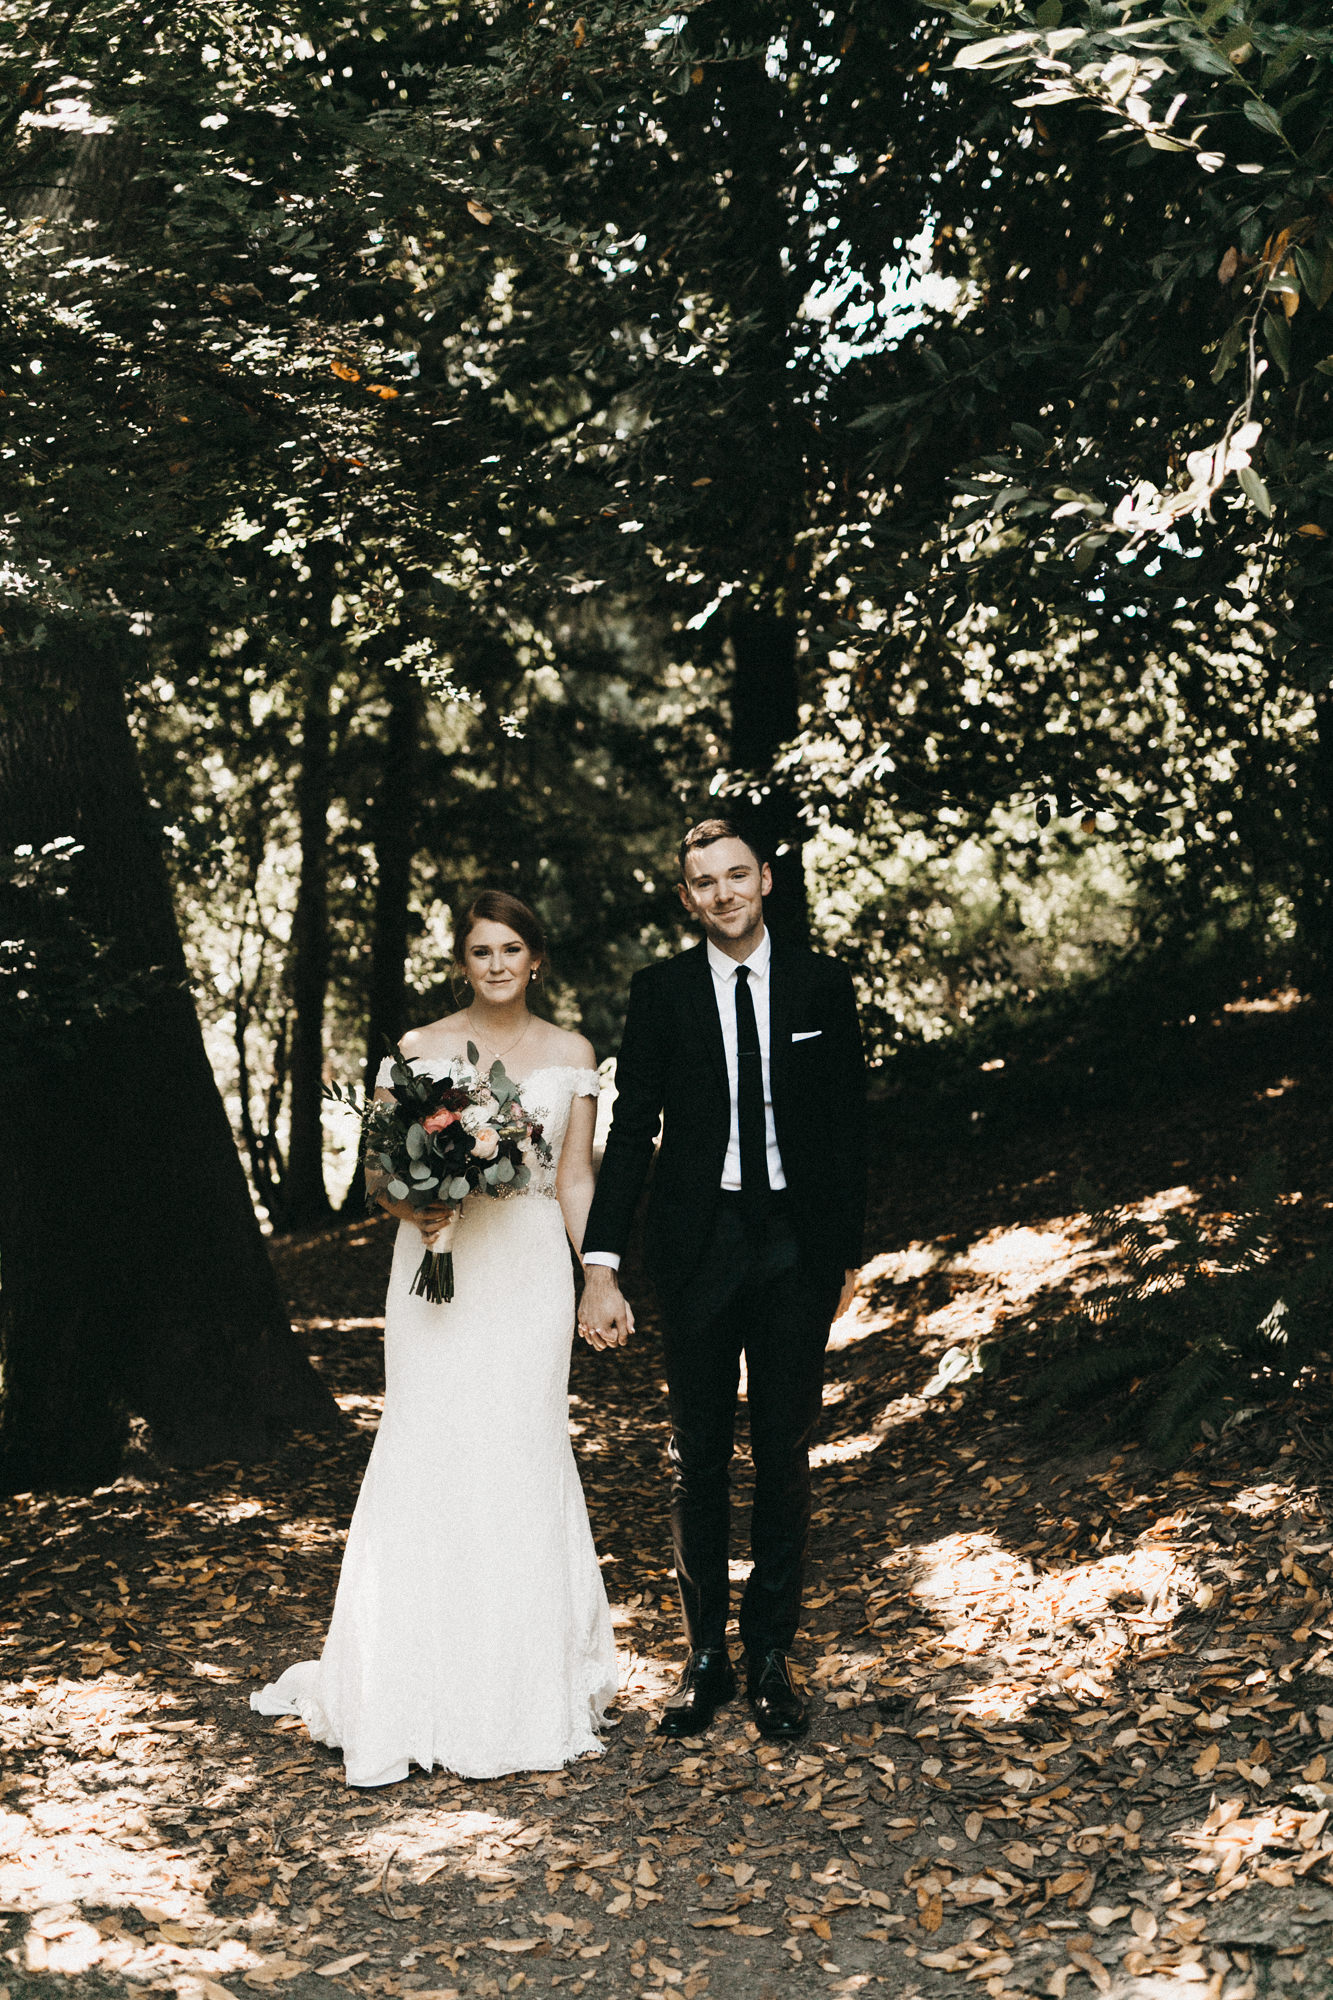 the_evergreen_portland_wedding-21.jpg